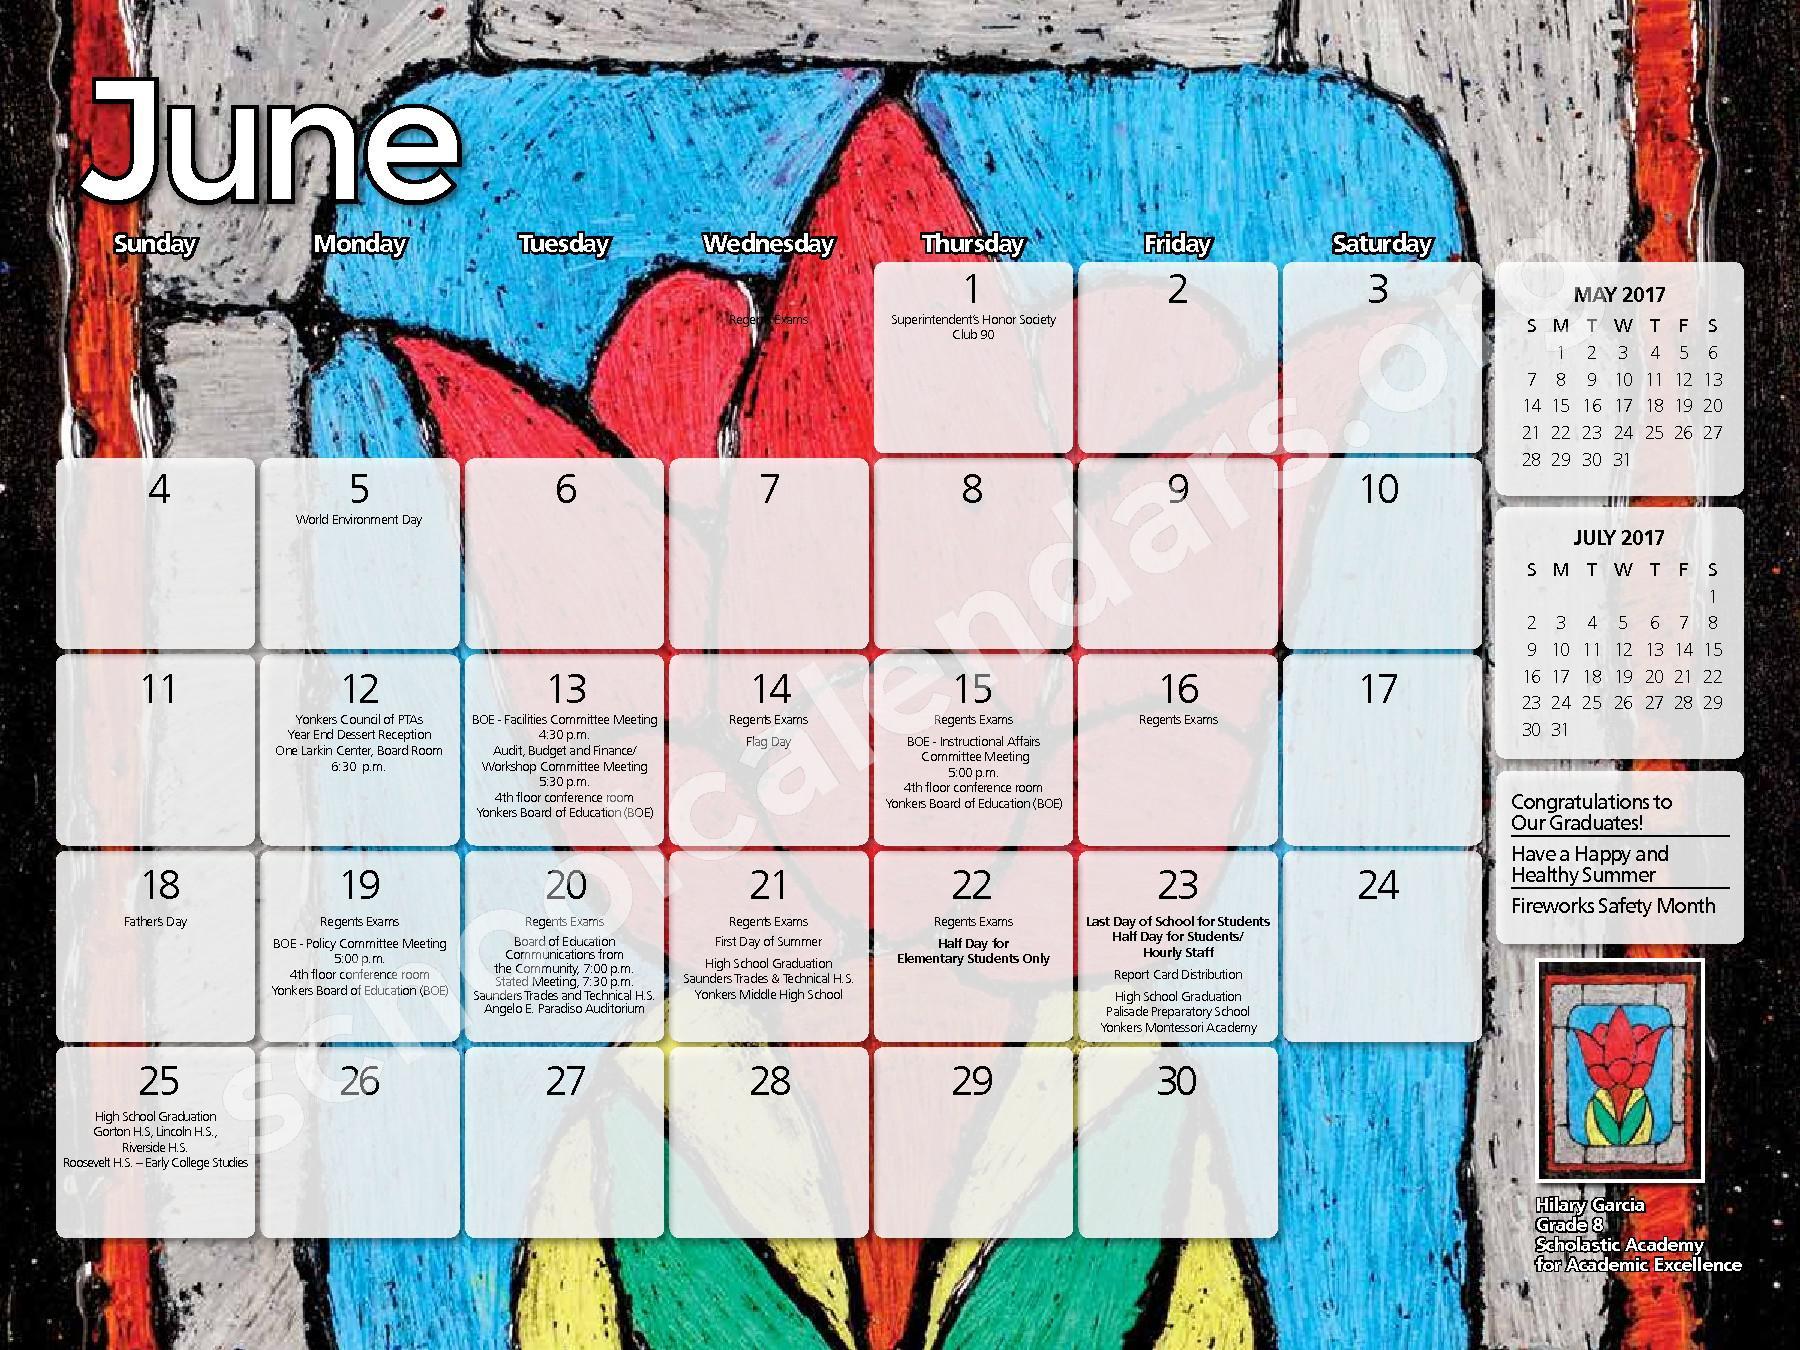 2017 - 2018 District Calendar – Yonkers City School District – page 23